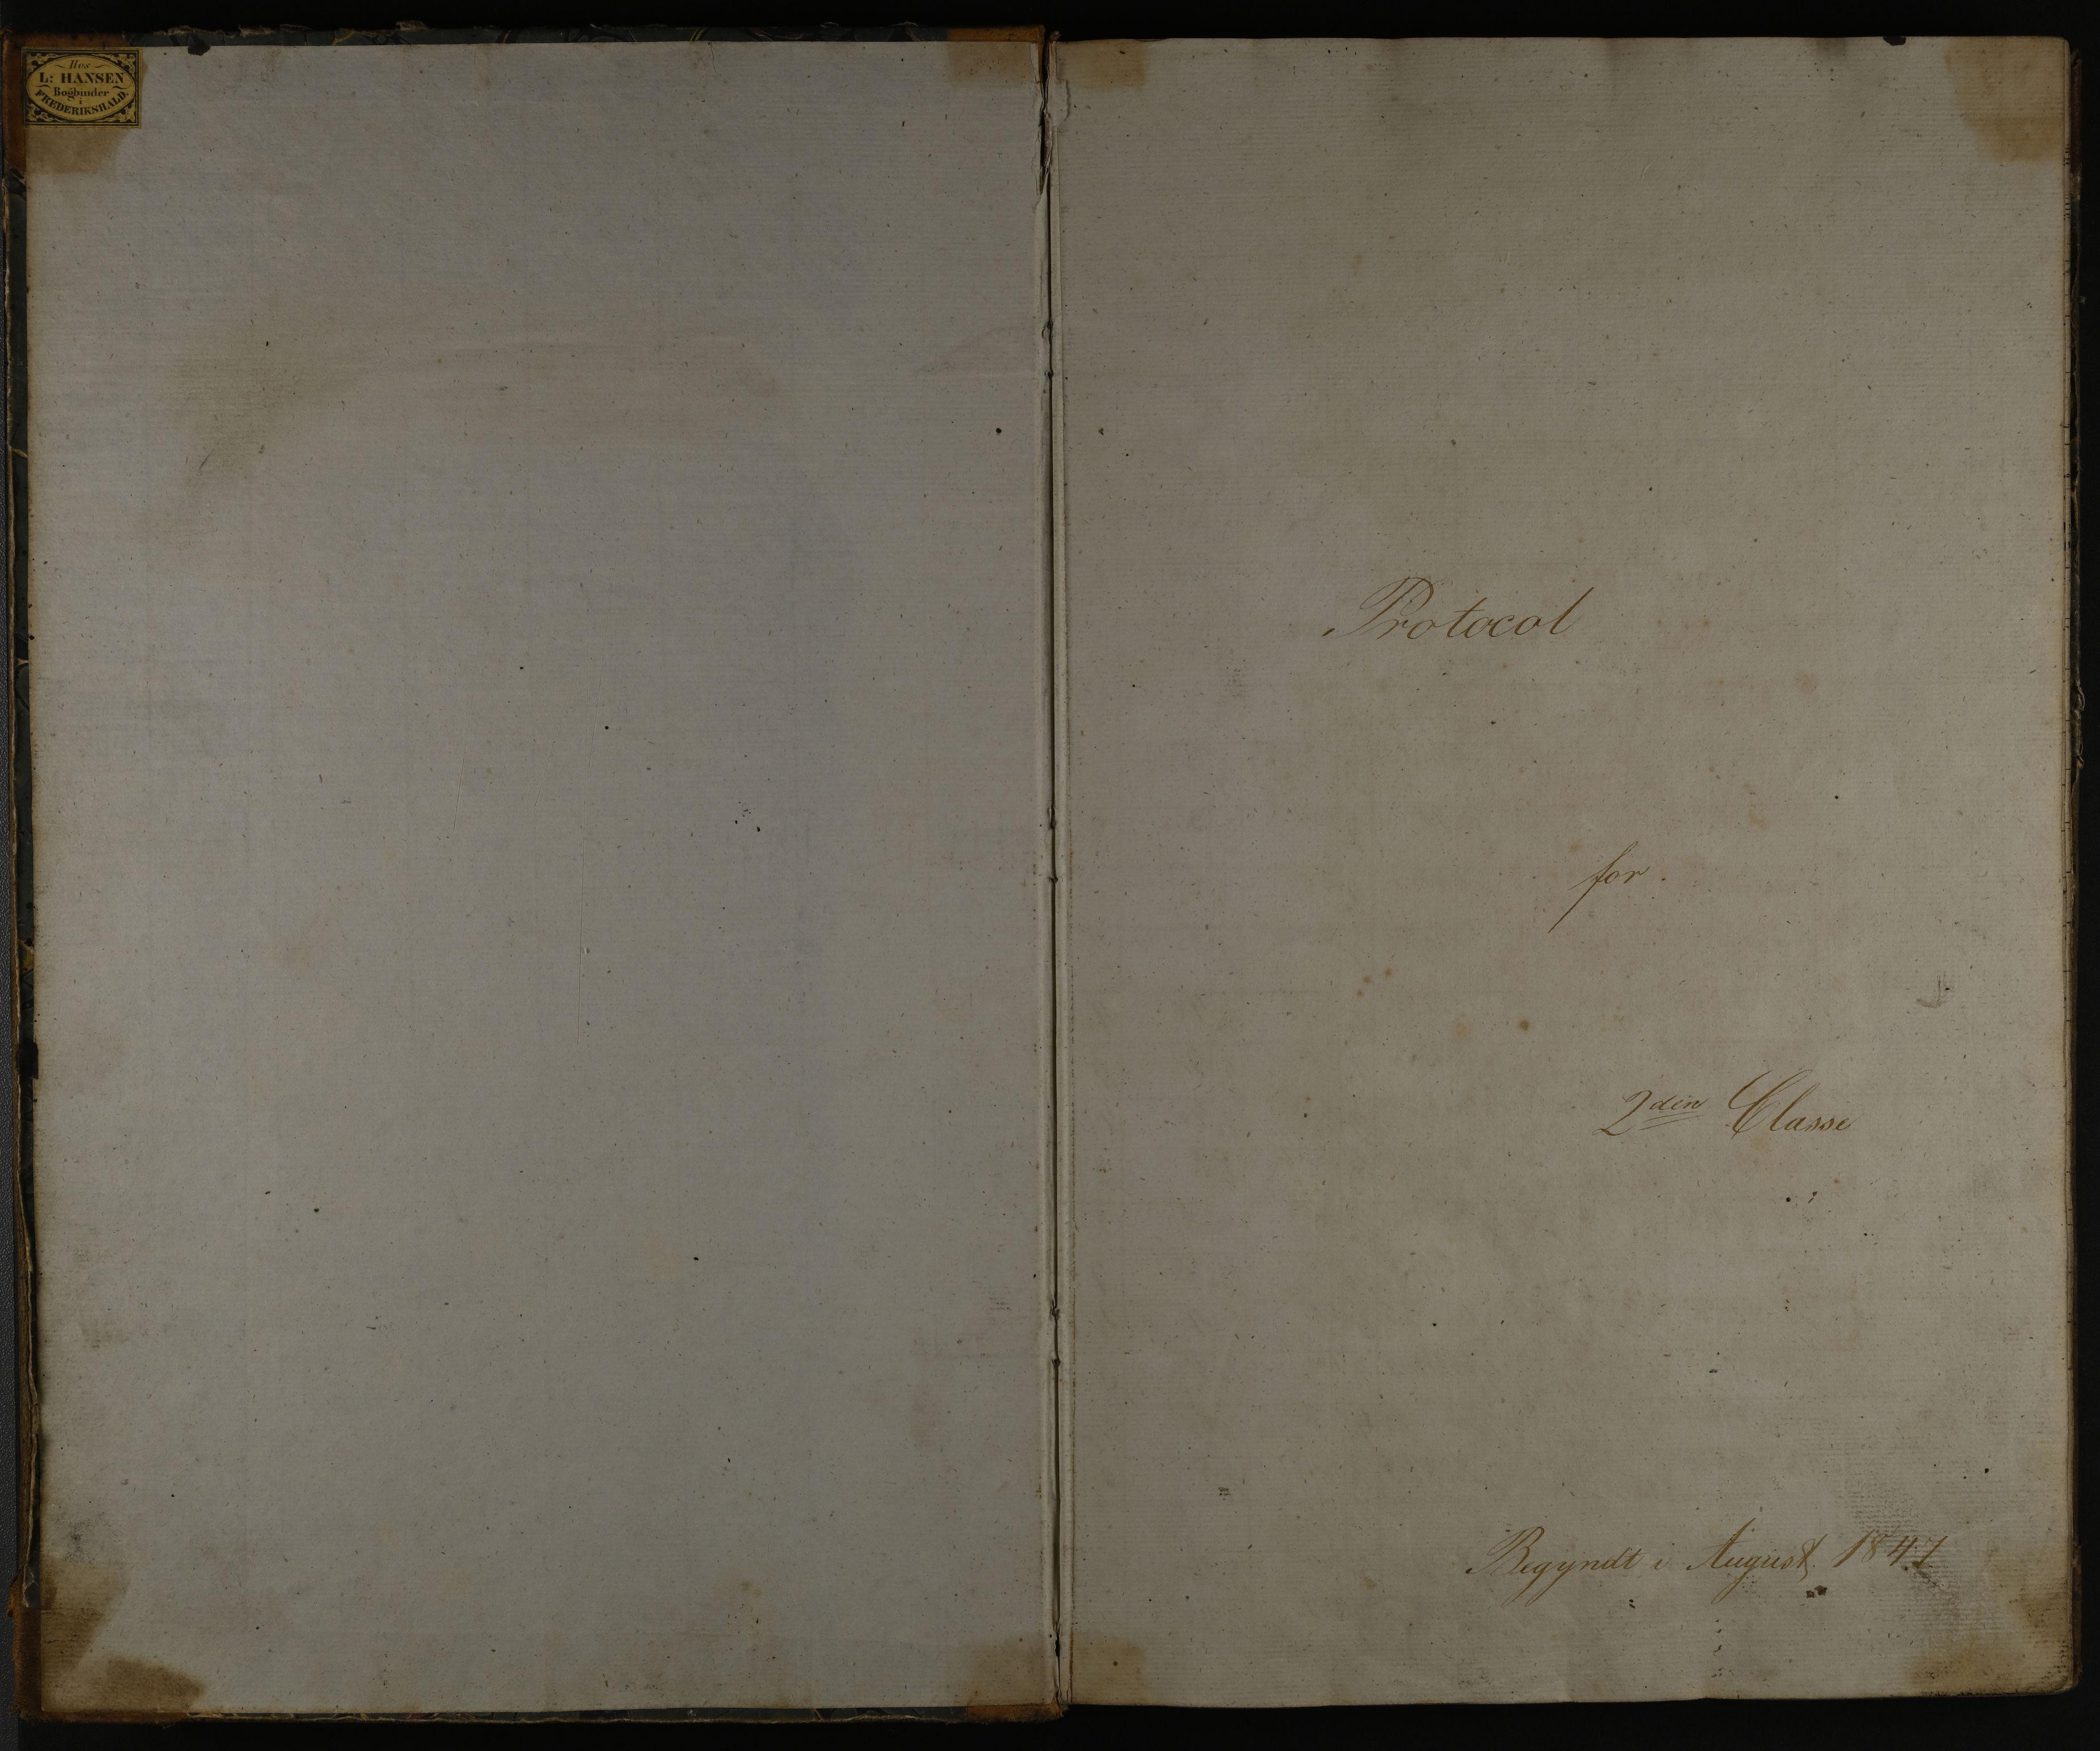 IKAO, Halden kommune. Fredrikshalds Borgerskole. Karakterprotokoll, 2. klasse, 1847-1851, 1847-1851